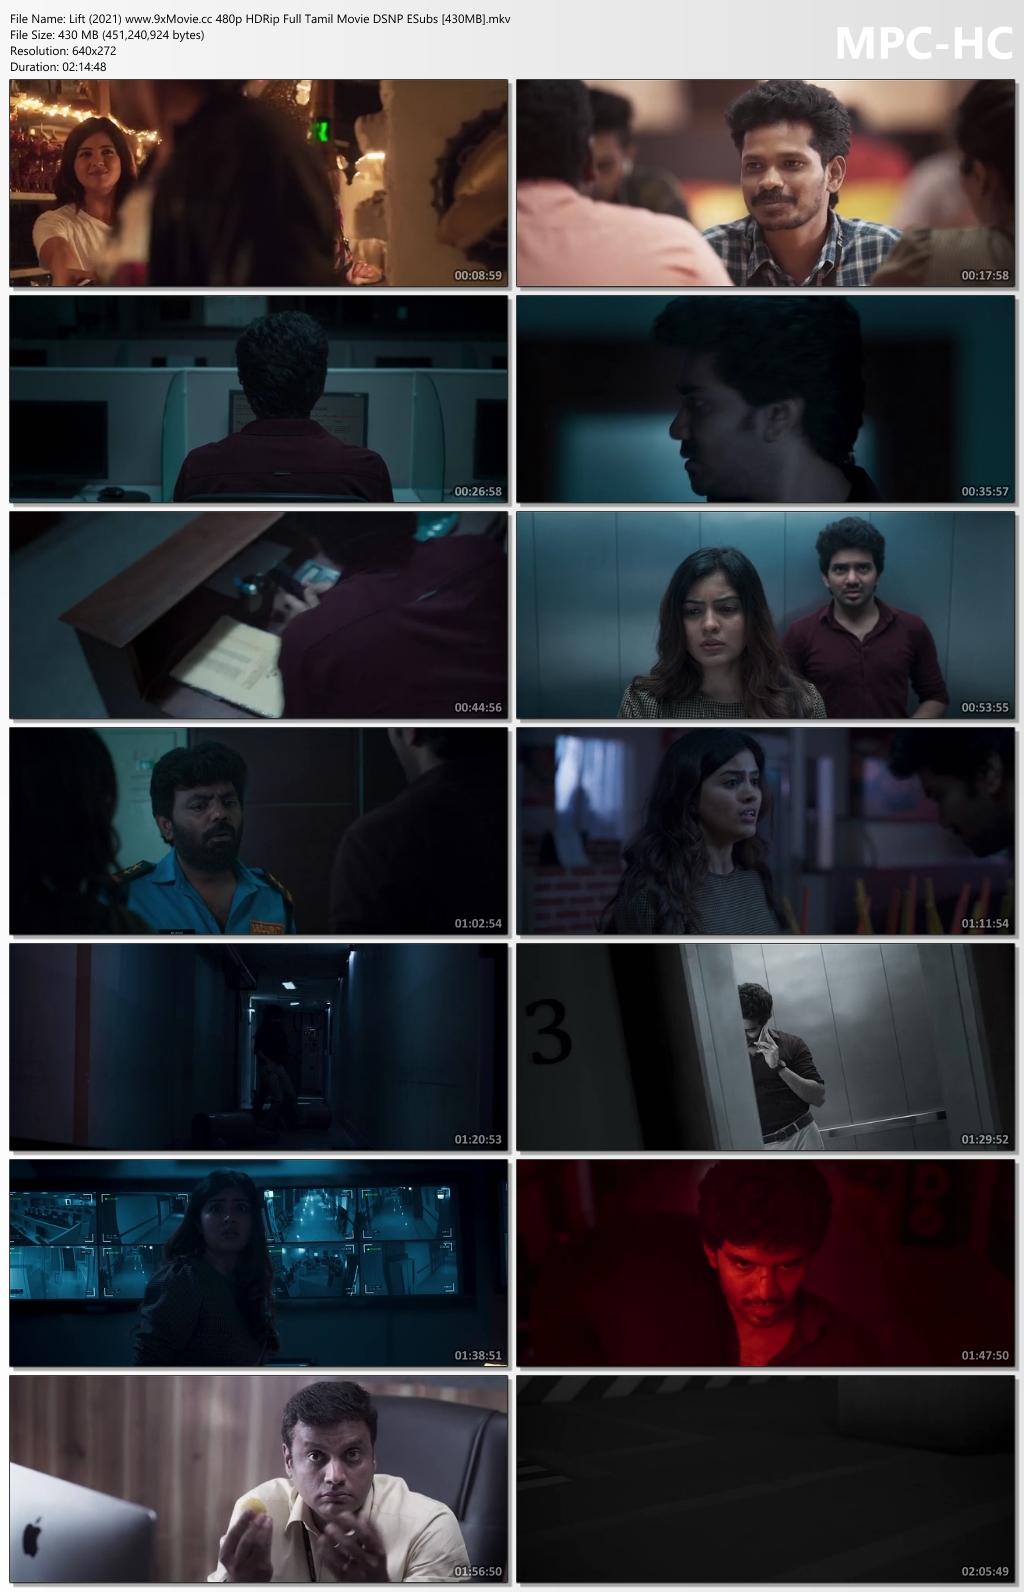 Lift-2021-www-9x-Movie-cc-480p-HDRip-Full-Tamil-Movie-DSNP-ESubs-430-MB-mkv